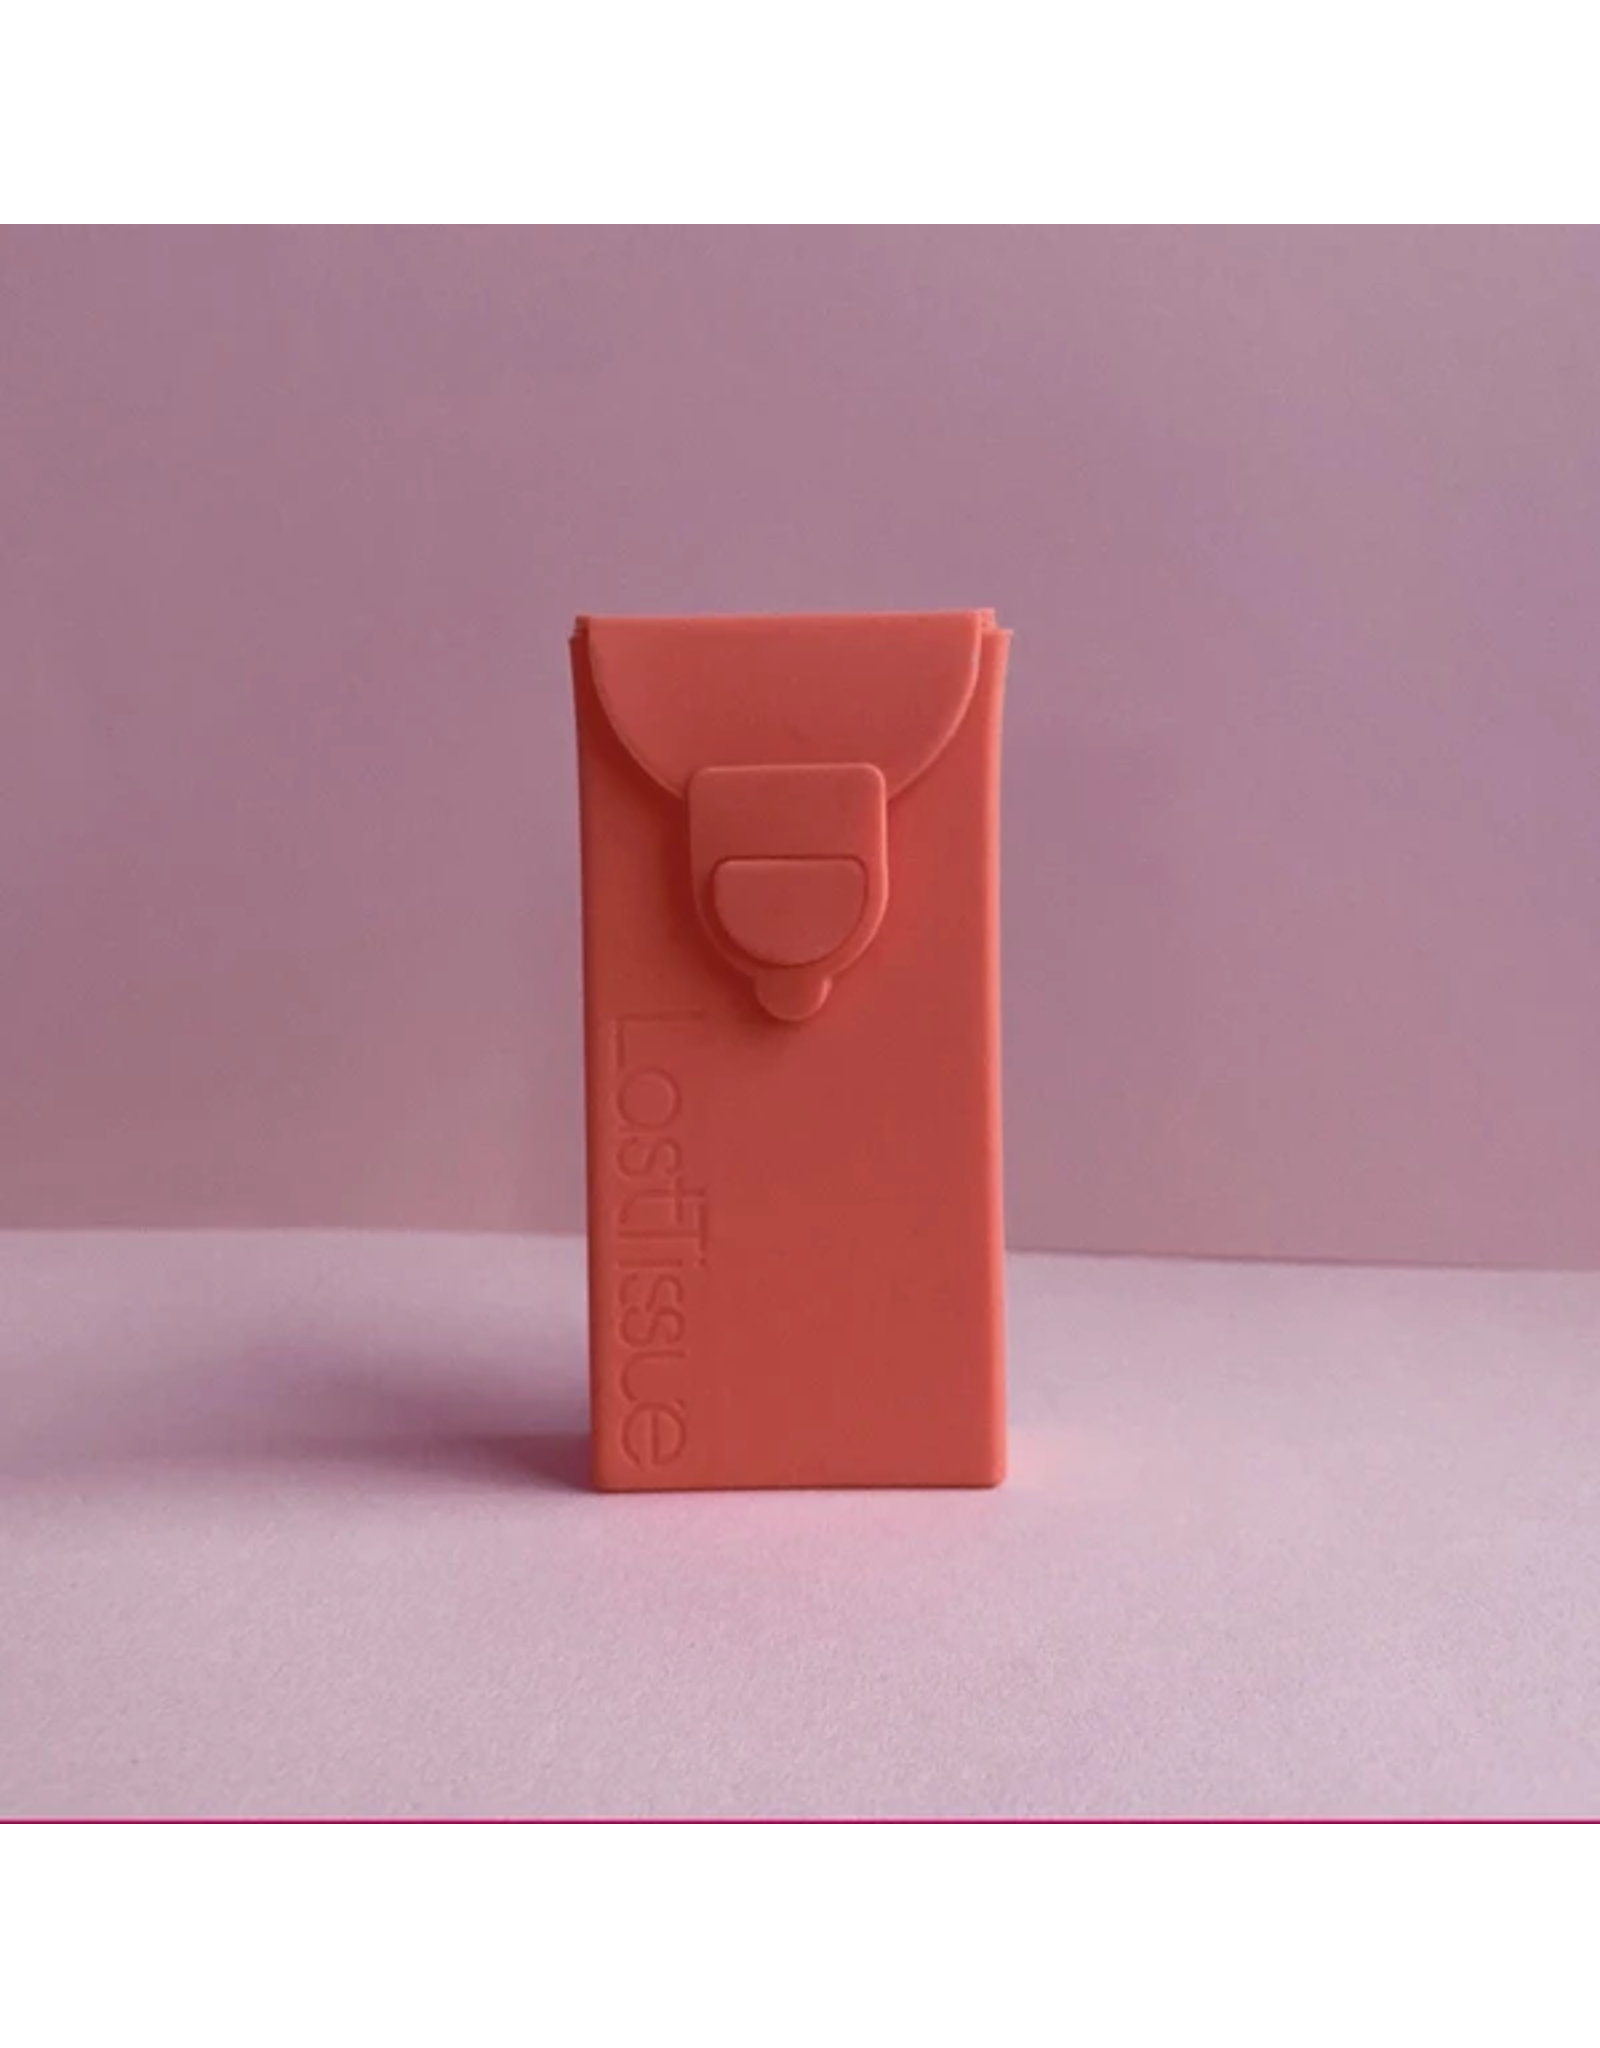 Last Object Last Tissue - A Modern Take on the Hankerchief